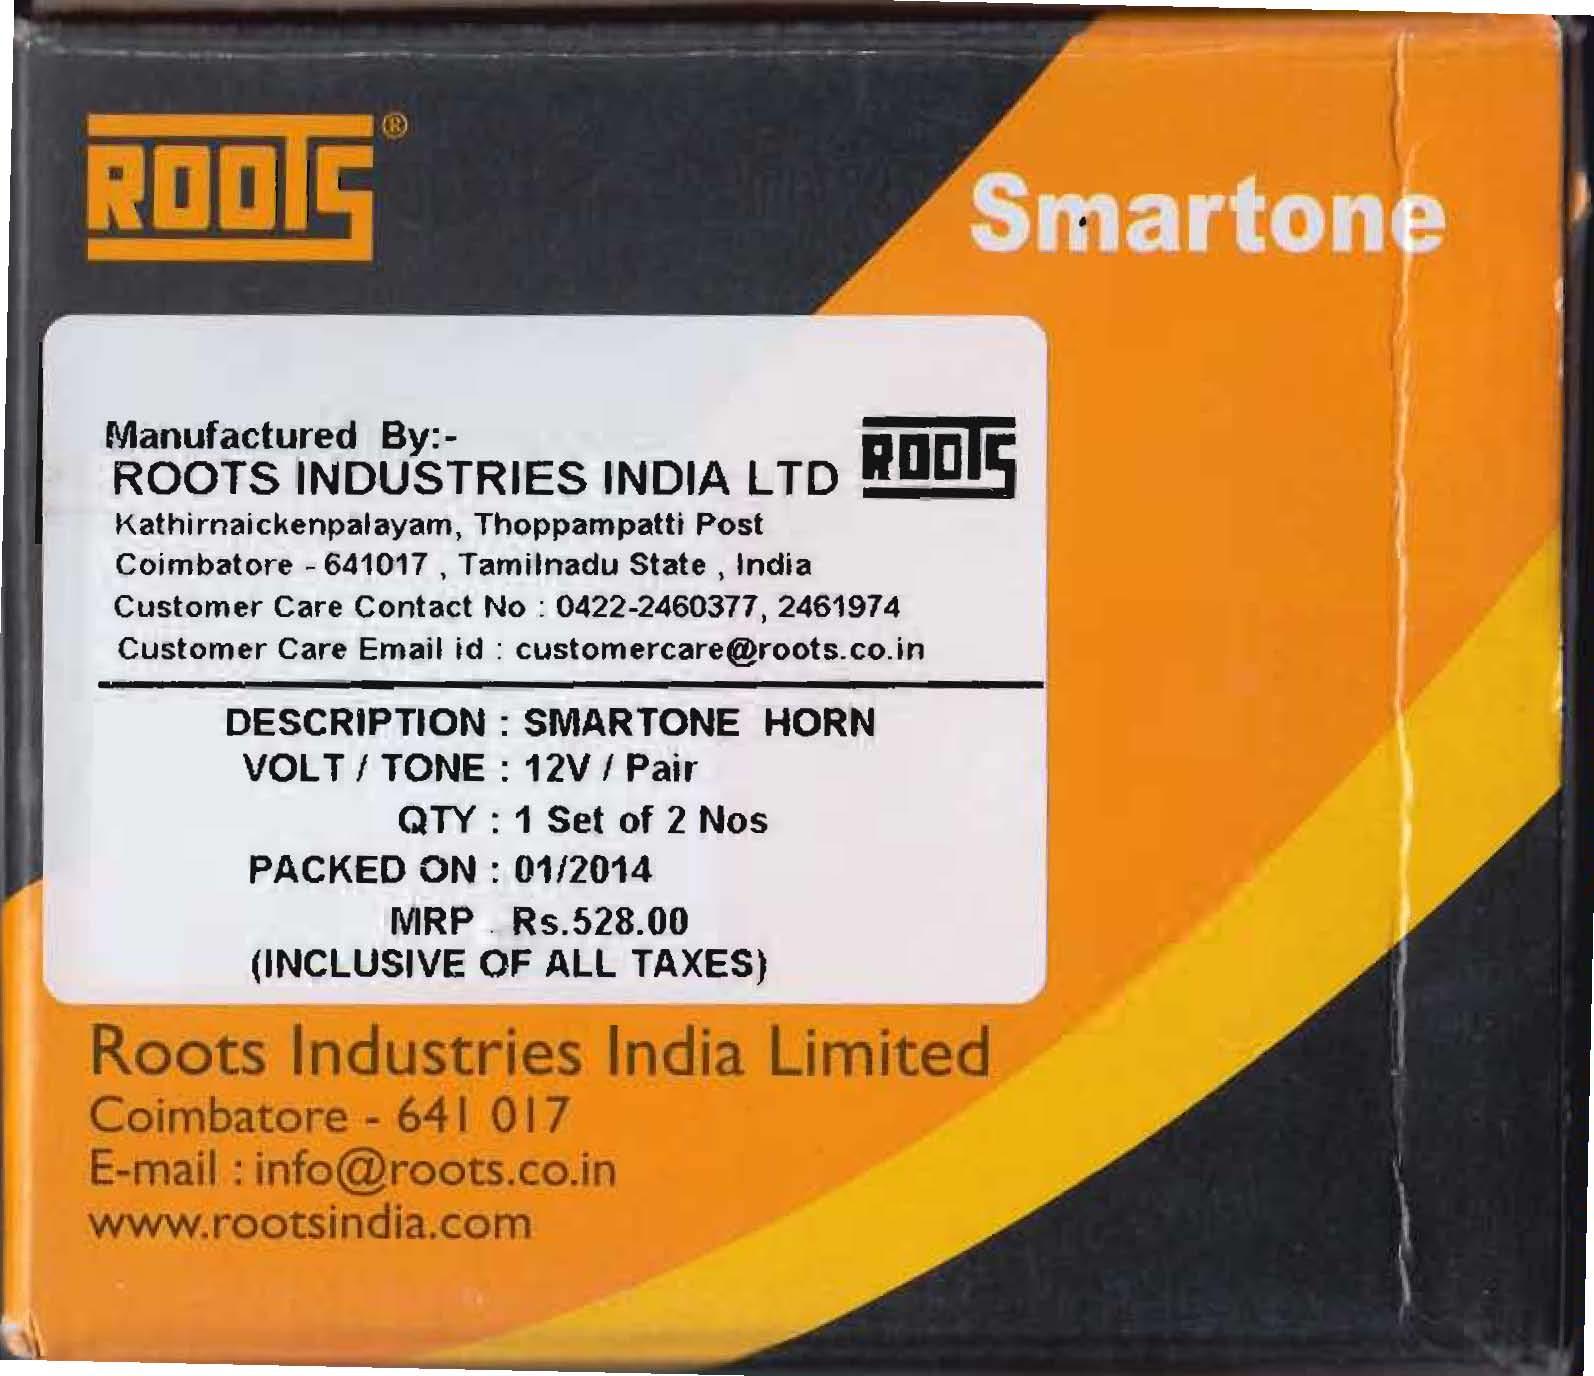 roots industries ltd india